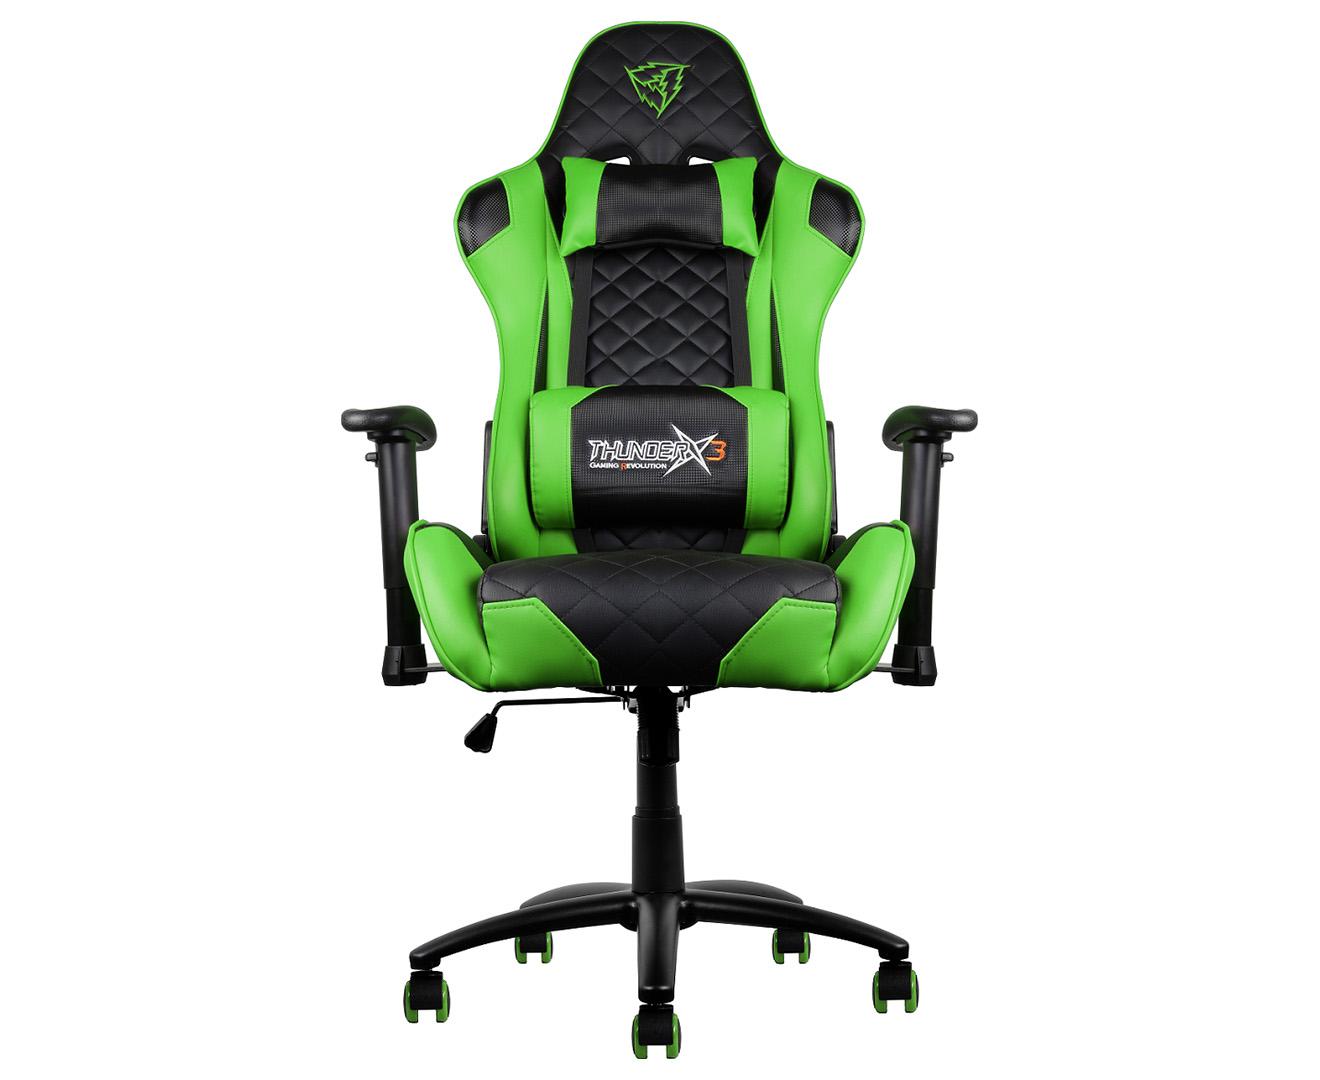 Wondrous Thunderx3 Tgc12 Gaming Chair Black Green Pdpeps Interior Chair Design Pdpepsorg